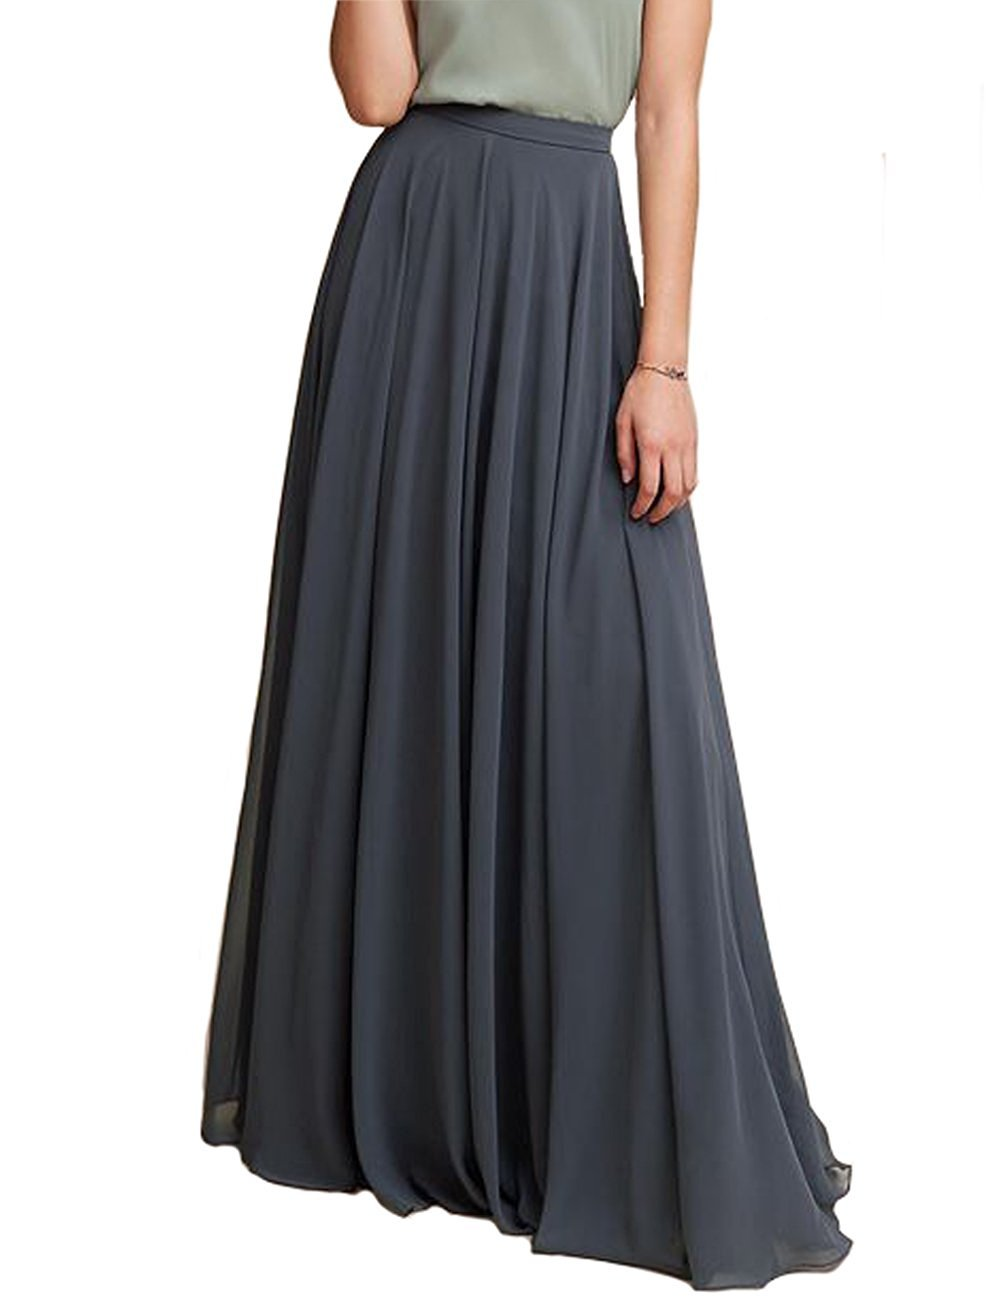 Omelas Women Long Floor Length Chiffon High Waist Skirt Maxi Bridesmaid Pary Dress (White, XXXL)